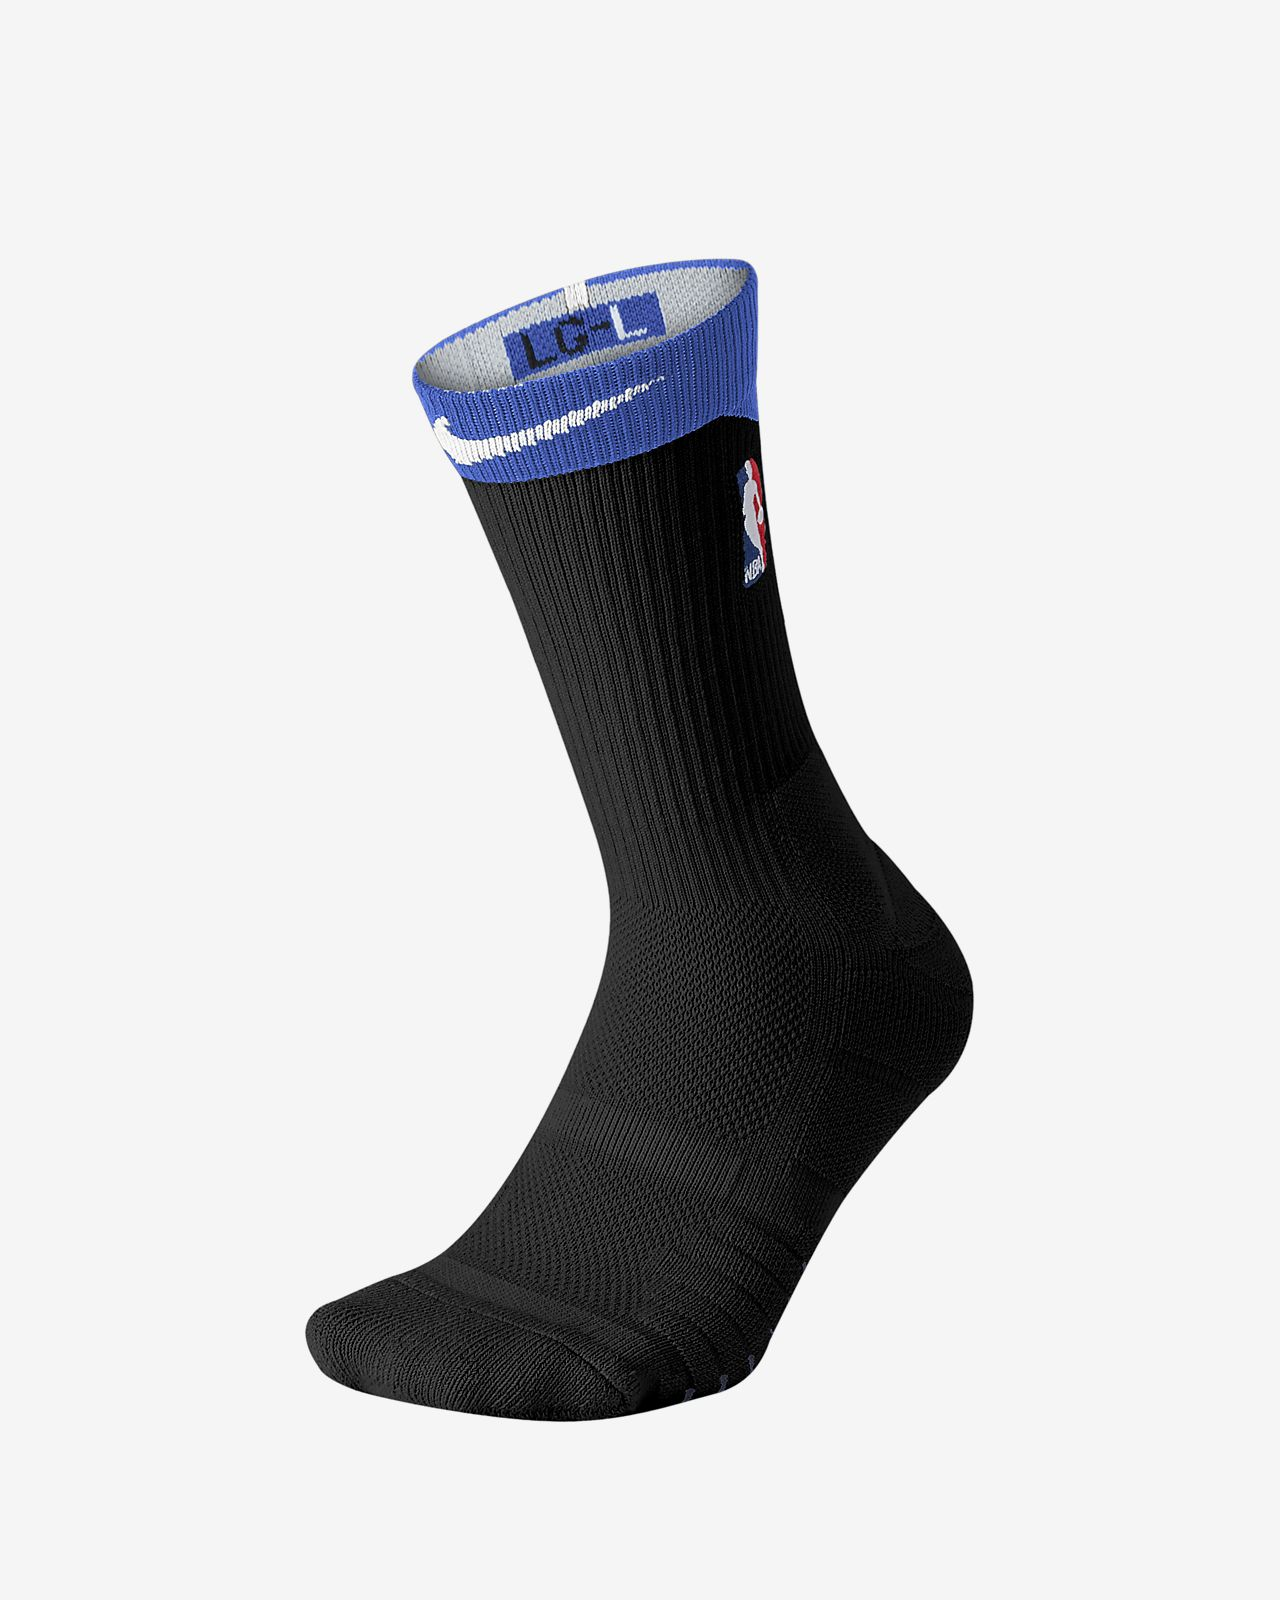 76ca4aef2dd7 Nike Elite Quick Crew NBA Socks. Nike.com CA